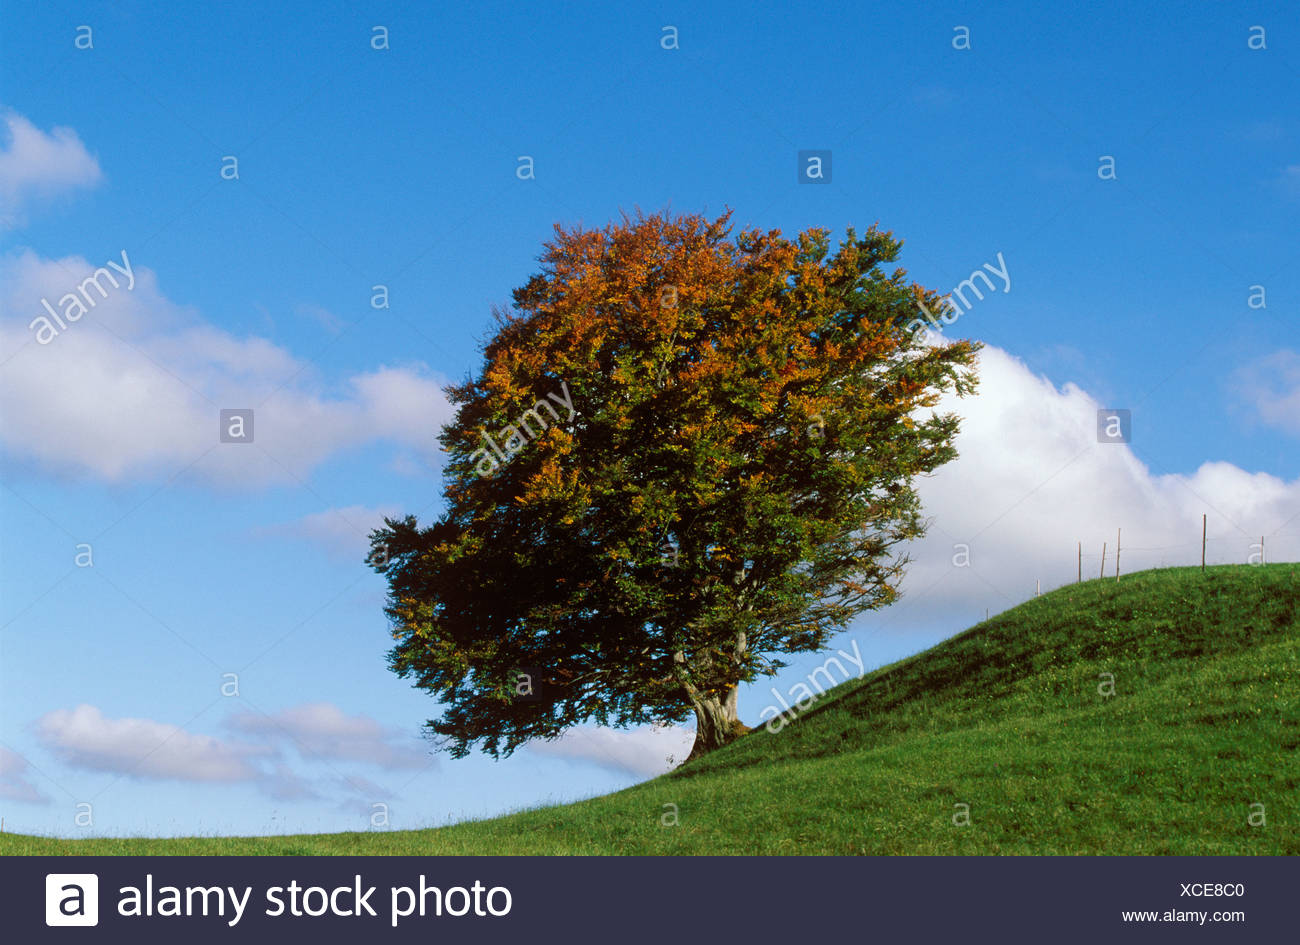 Beech tree (Fagus sylvatica) in autumn, East Allgaeu, Bavaria, Germany, Europe - Stock Image